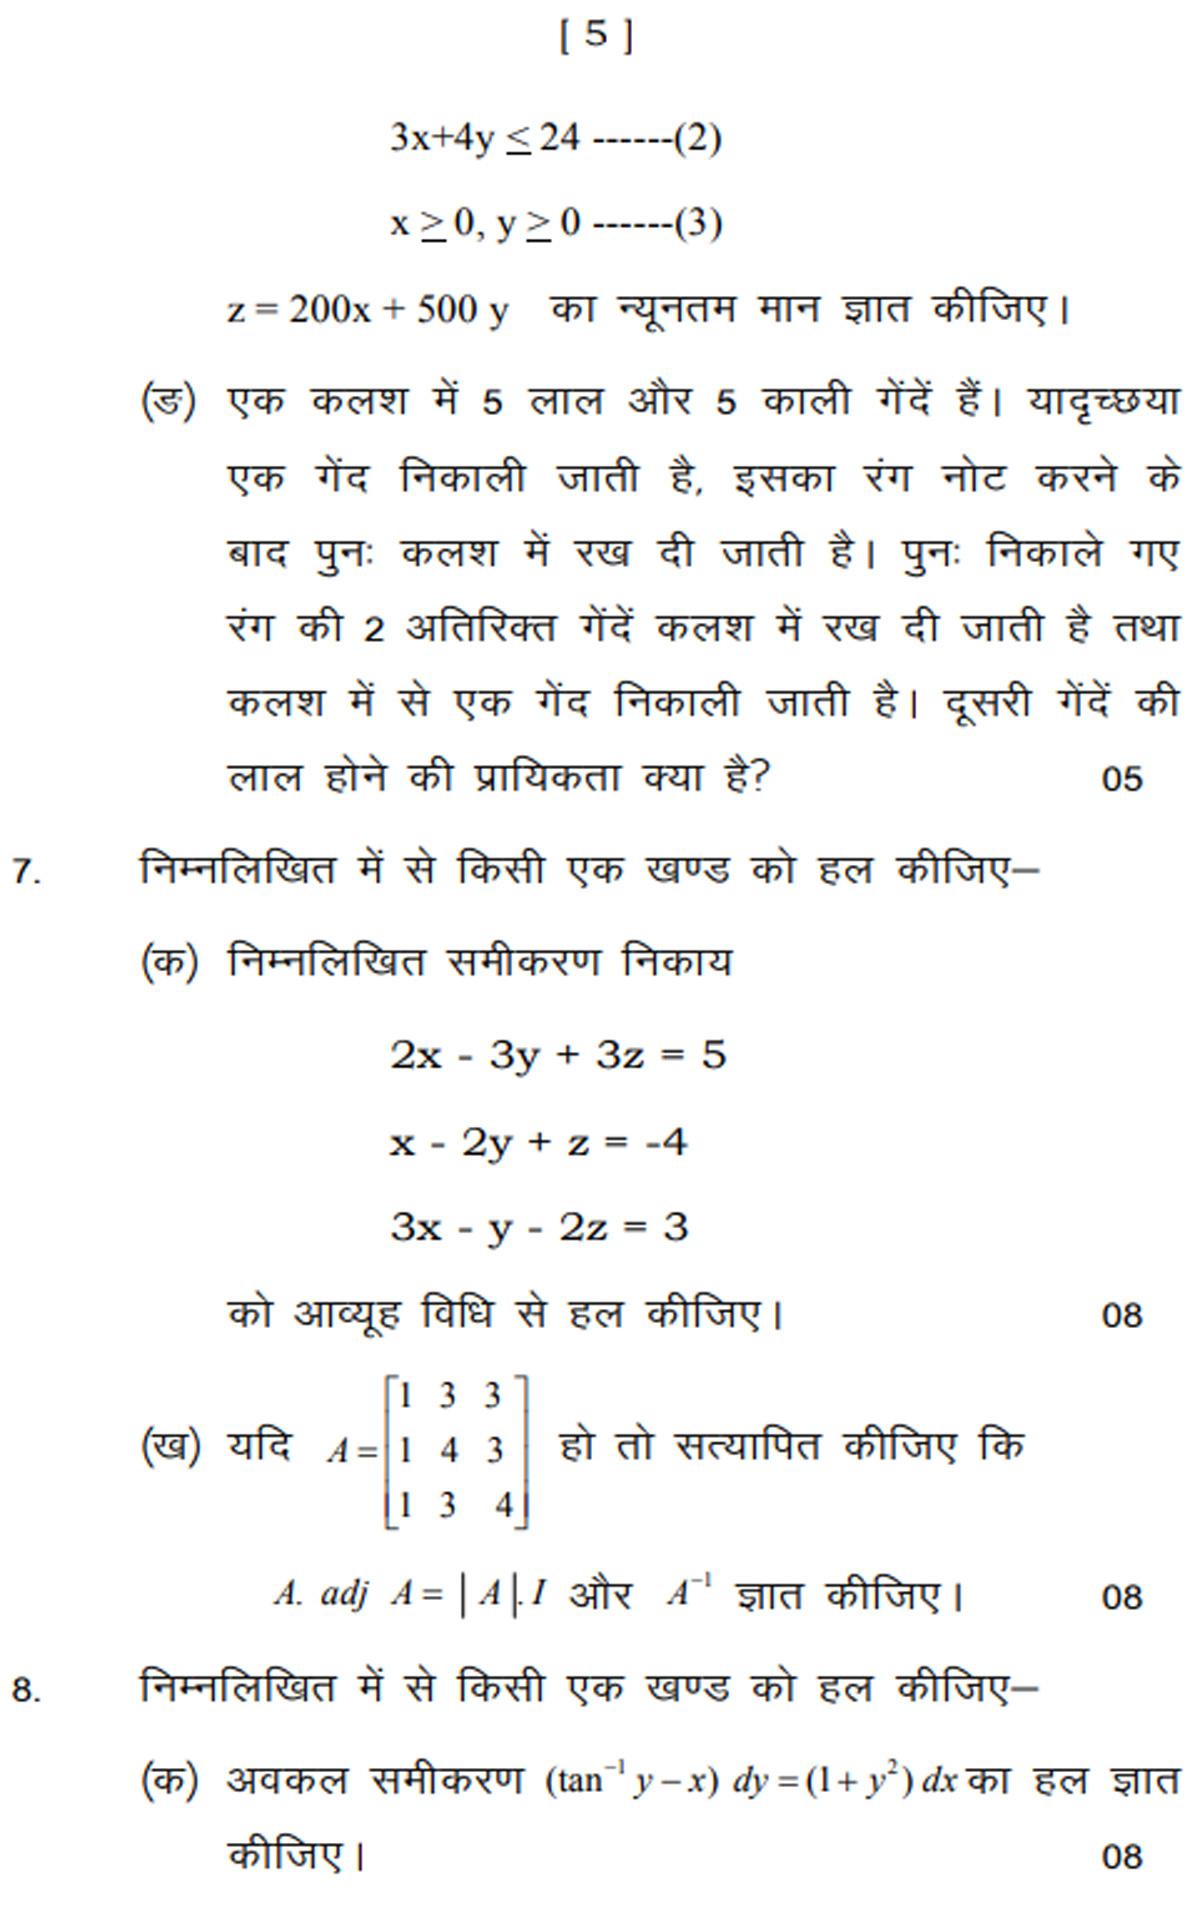 5. UP Board Class 12th Maths Model Test Paper